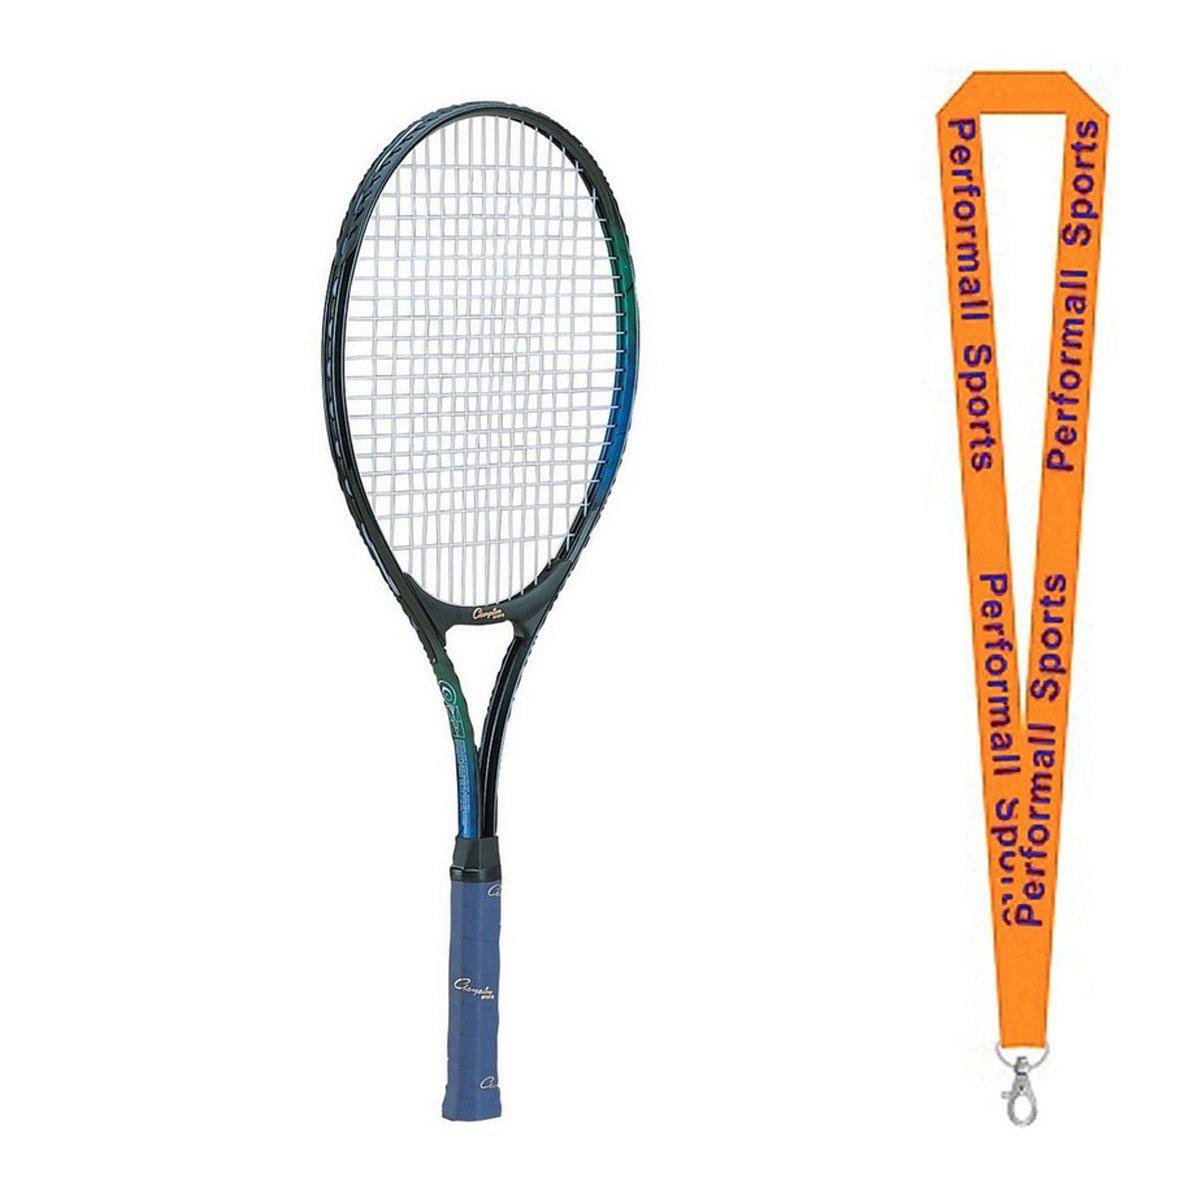 ChampionスポーツOversizeヘッドテニスラケットブラック/ブルーwith B01FSZ6BL8 1 performall 1p Lanyard atr40 performall – 1p B01FSZ6BL8, 大多喜町:c39c3945 --- cgt-tbc.fr